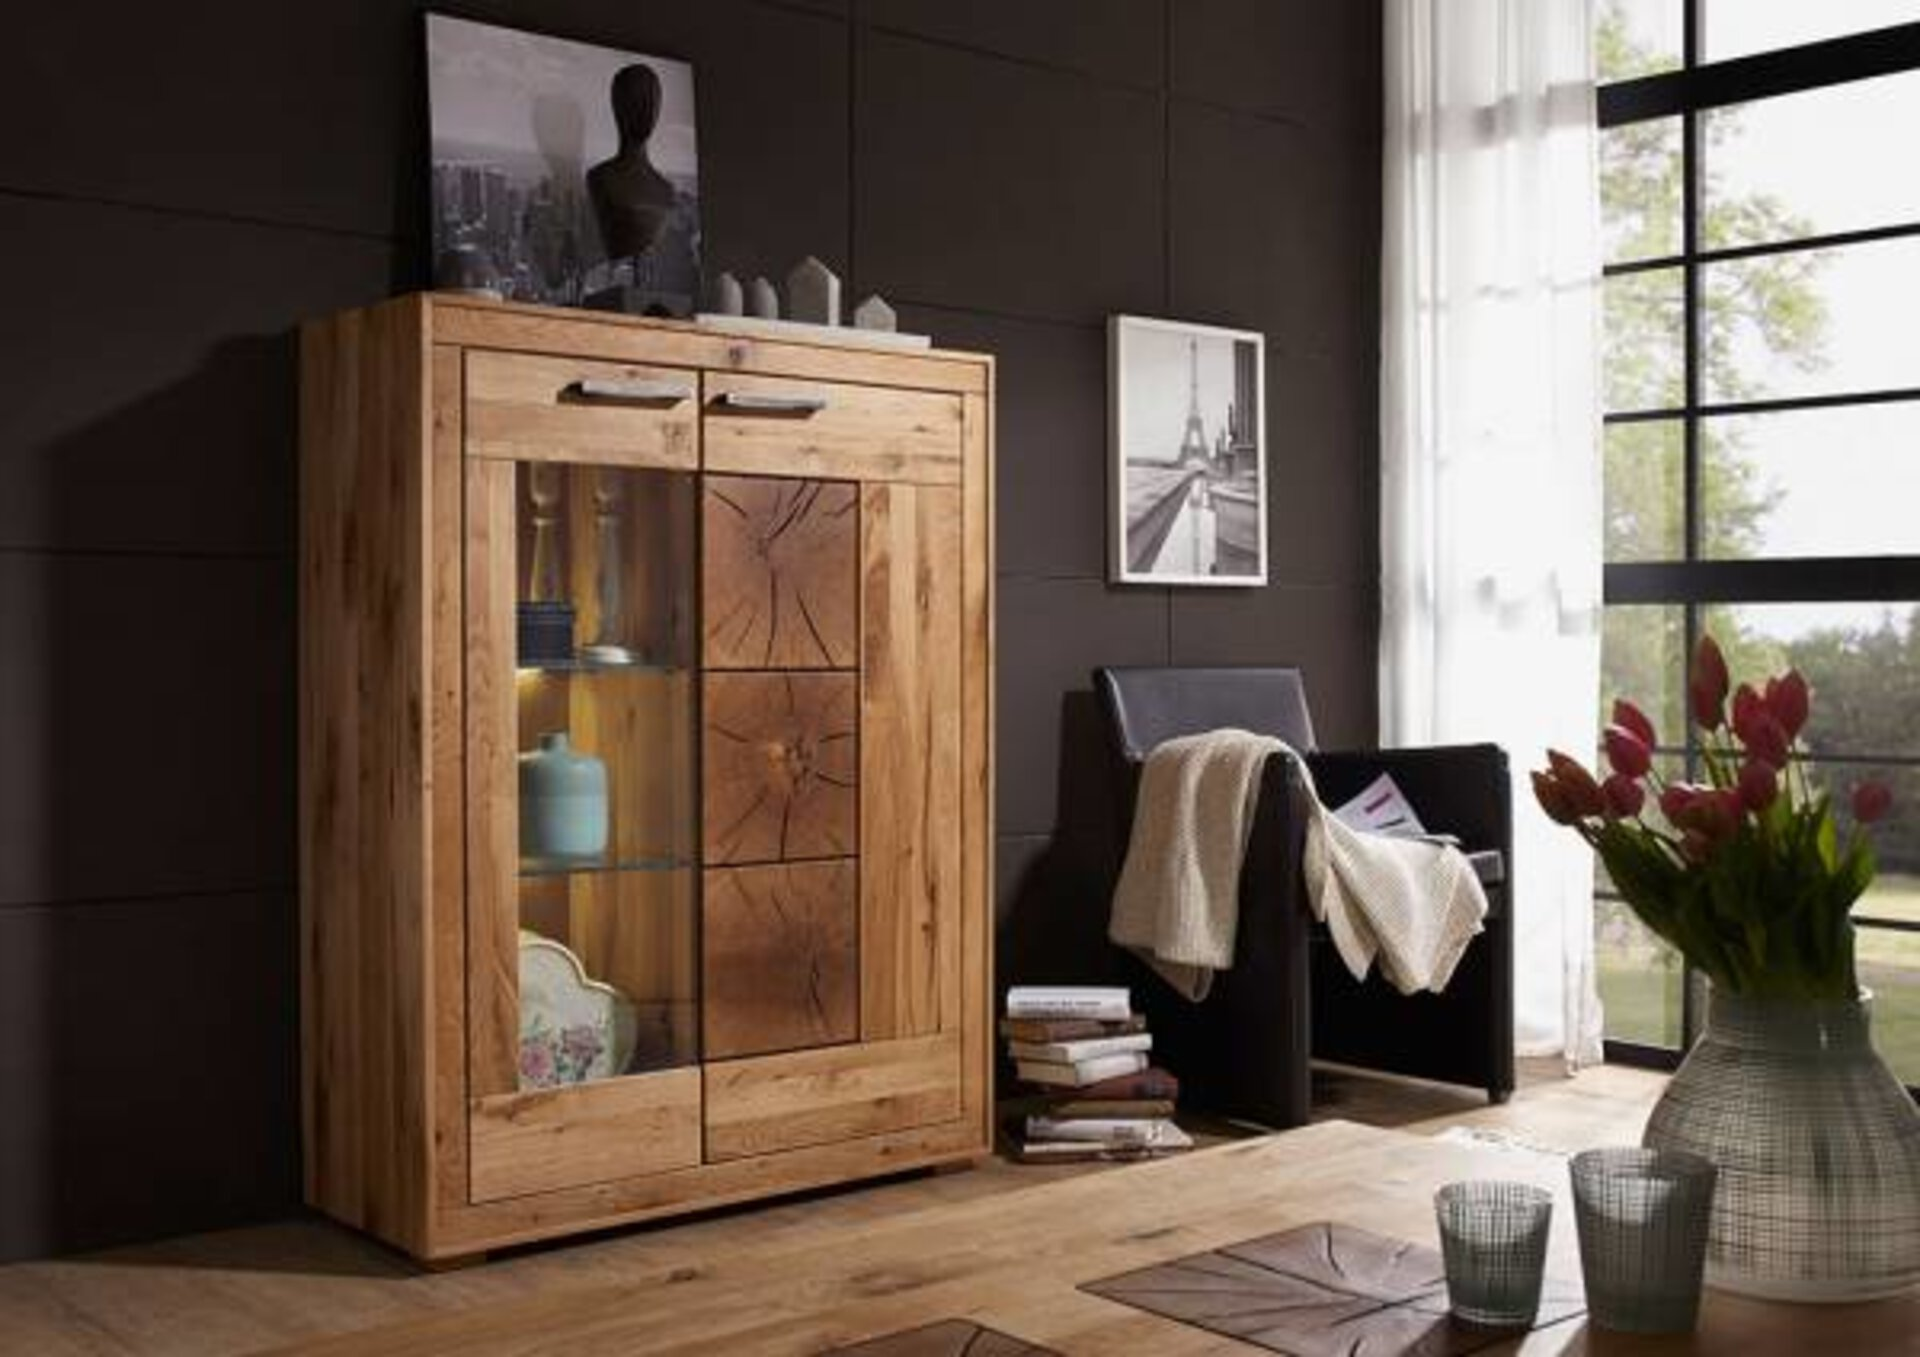 Highboard WZ-0315 CELECT Holz mehrfarbig 40 x 135 x 103 cm